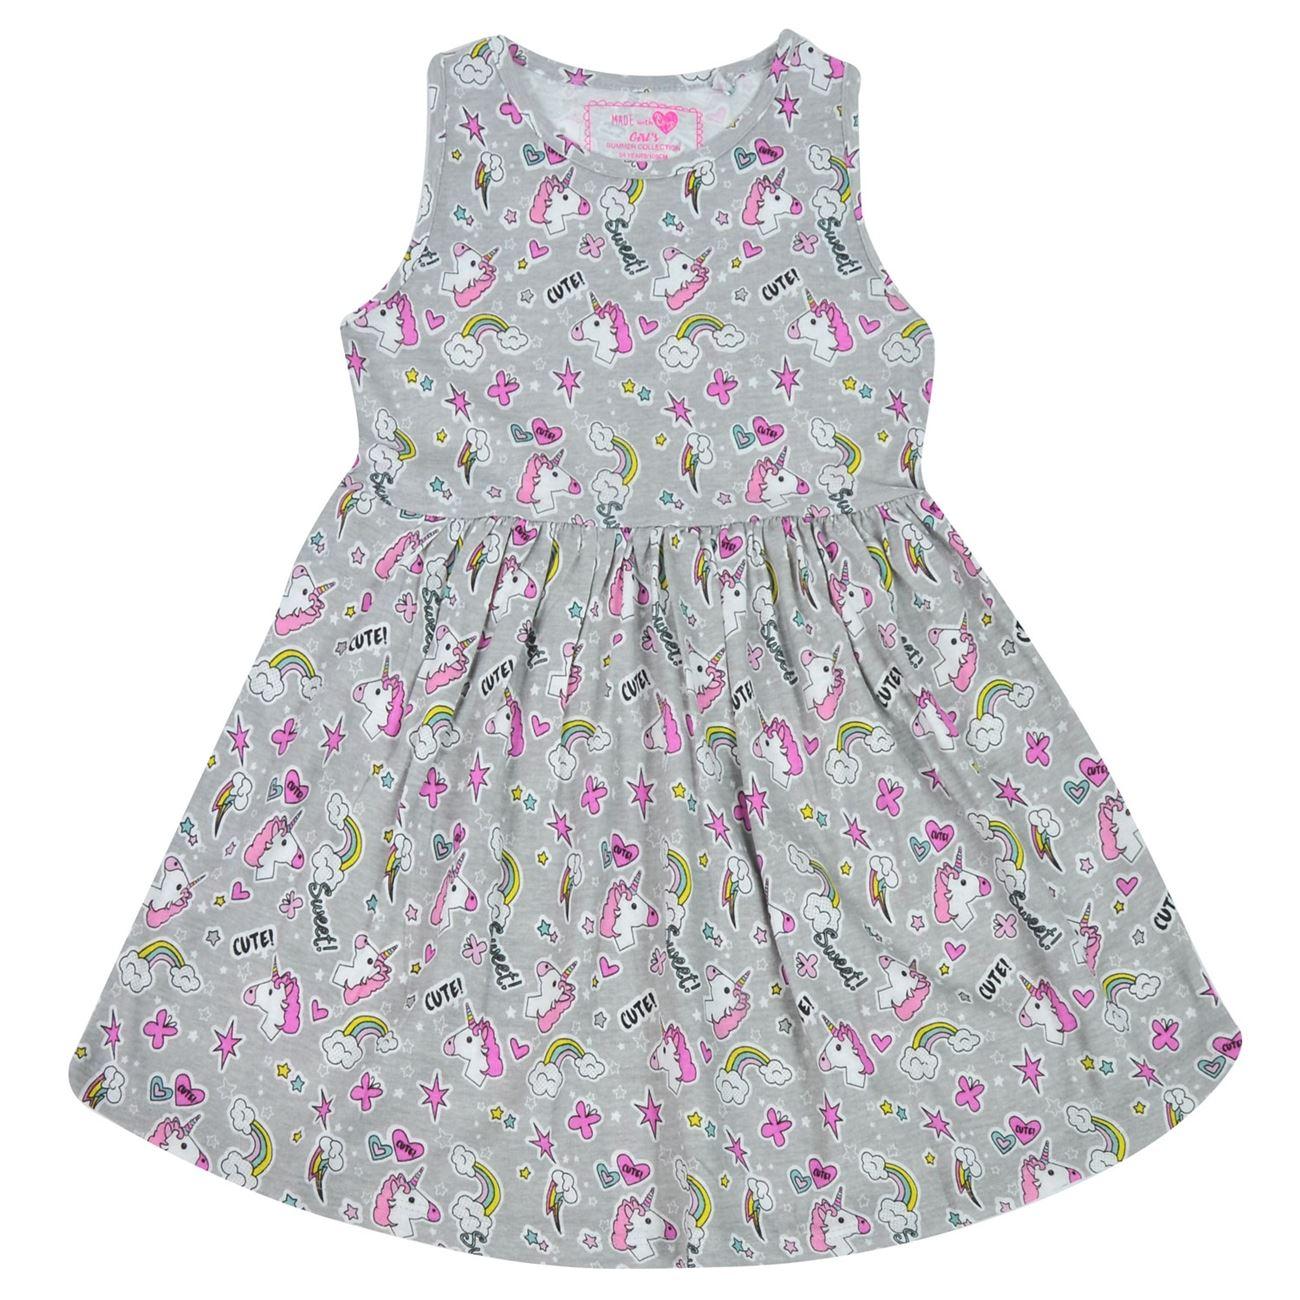 a134e700bcb Φόρεμα Αμάνικο Παιδικό Γκρι Μονόκεροι < Φορέματα για Κορίτσια | Jumbo